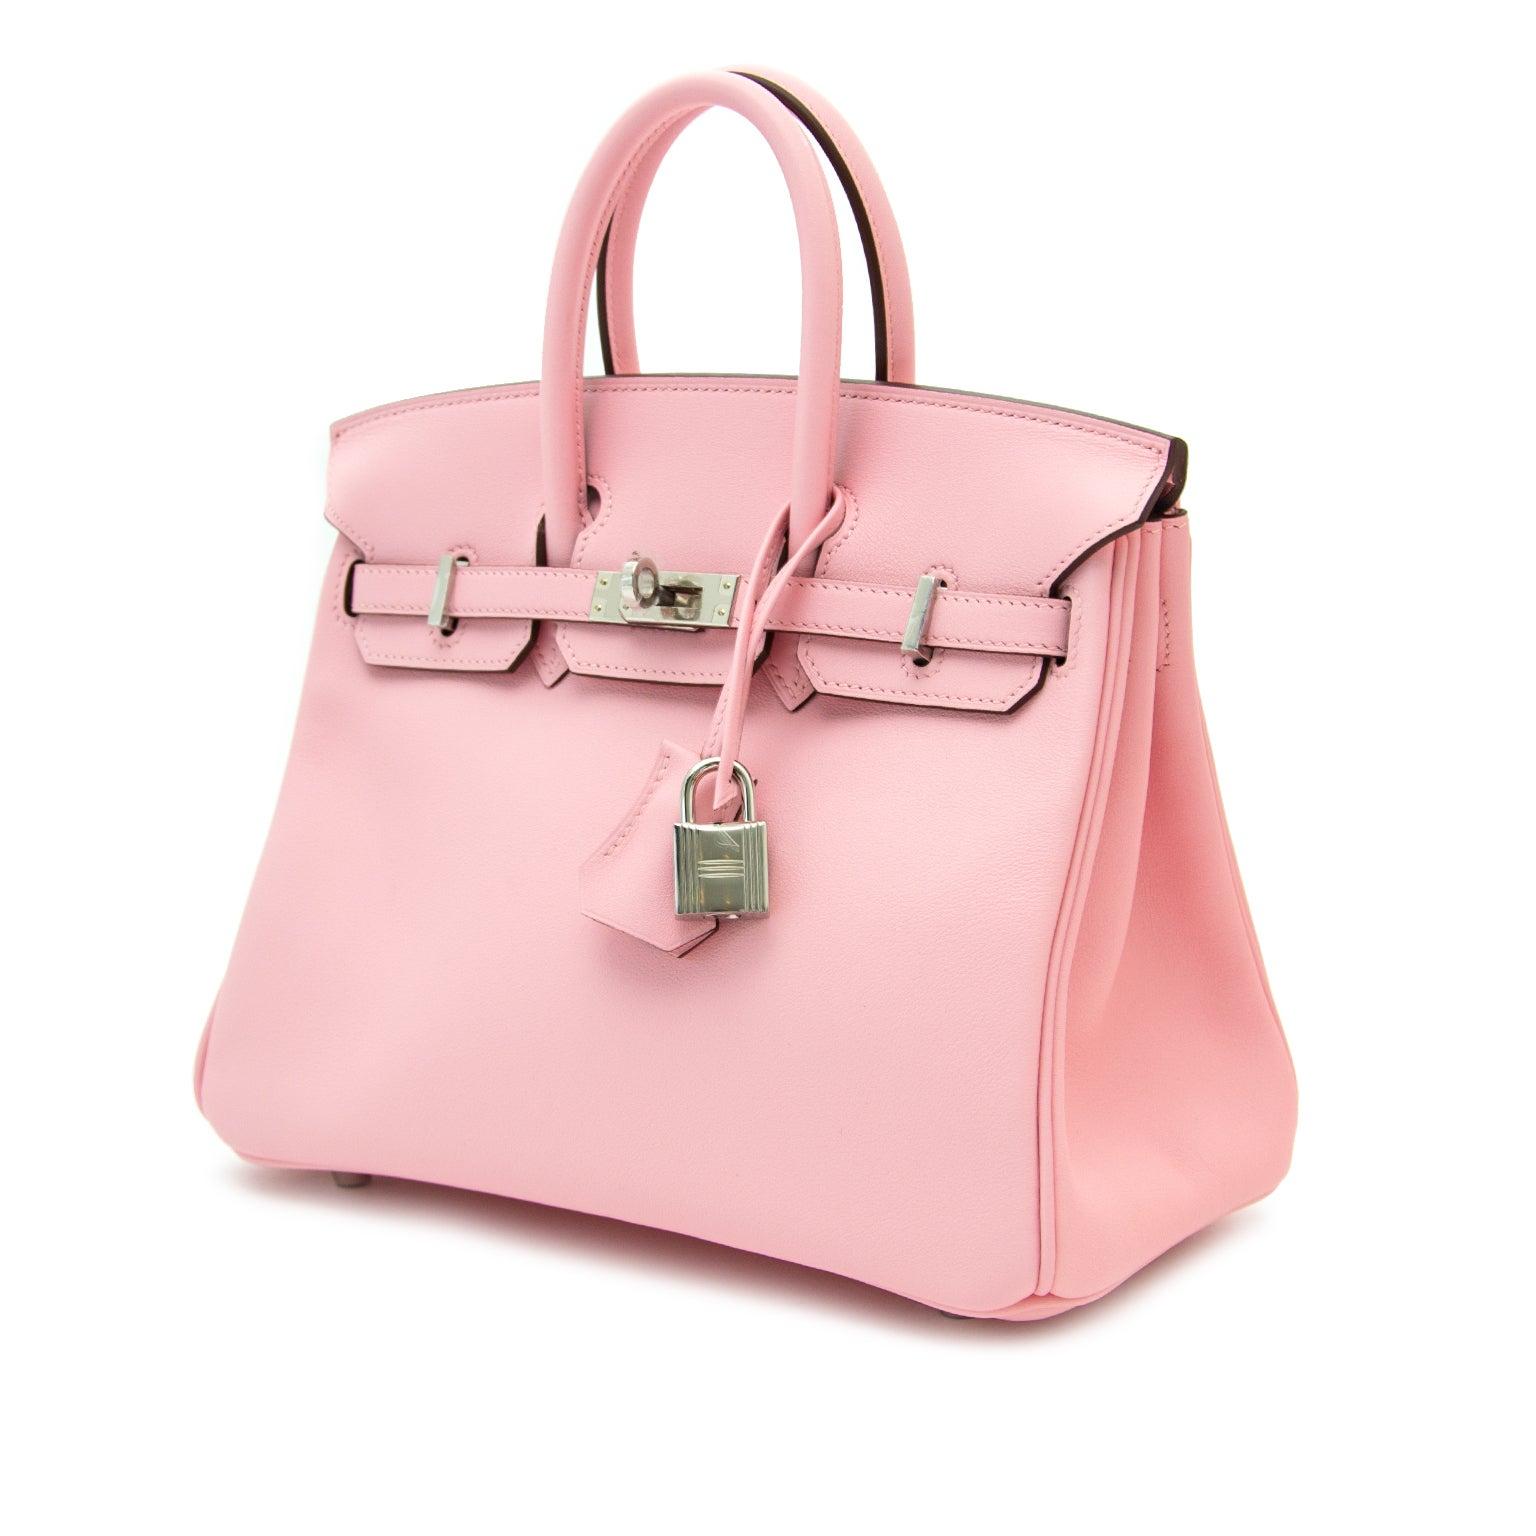 e898b40152 Very RARE and Brand New Hermès Birkin Rose Sakura 25 at 1stdibs